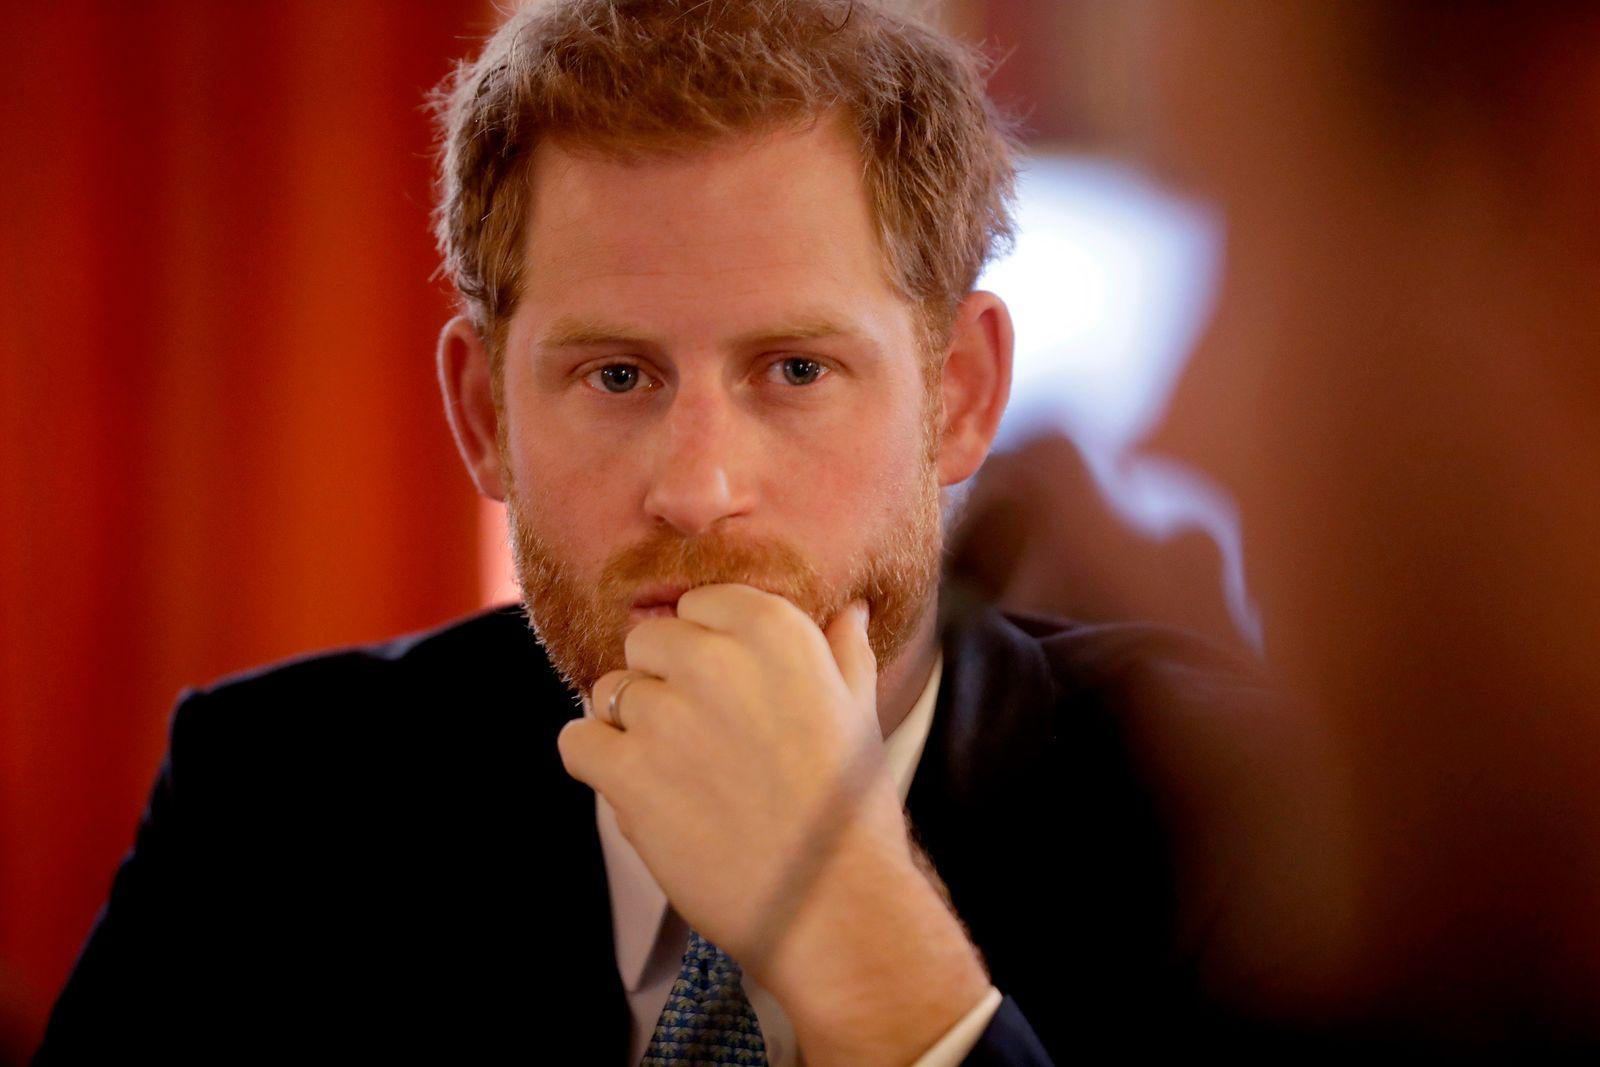 Jugendbotschafter des Commonwealth Prinz Harry